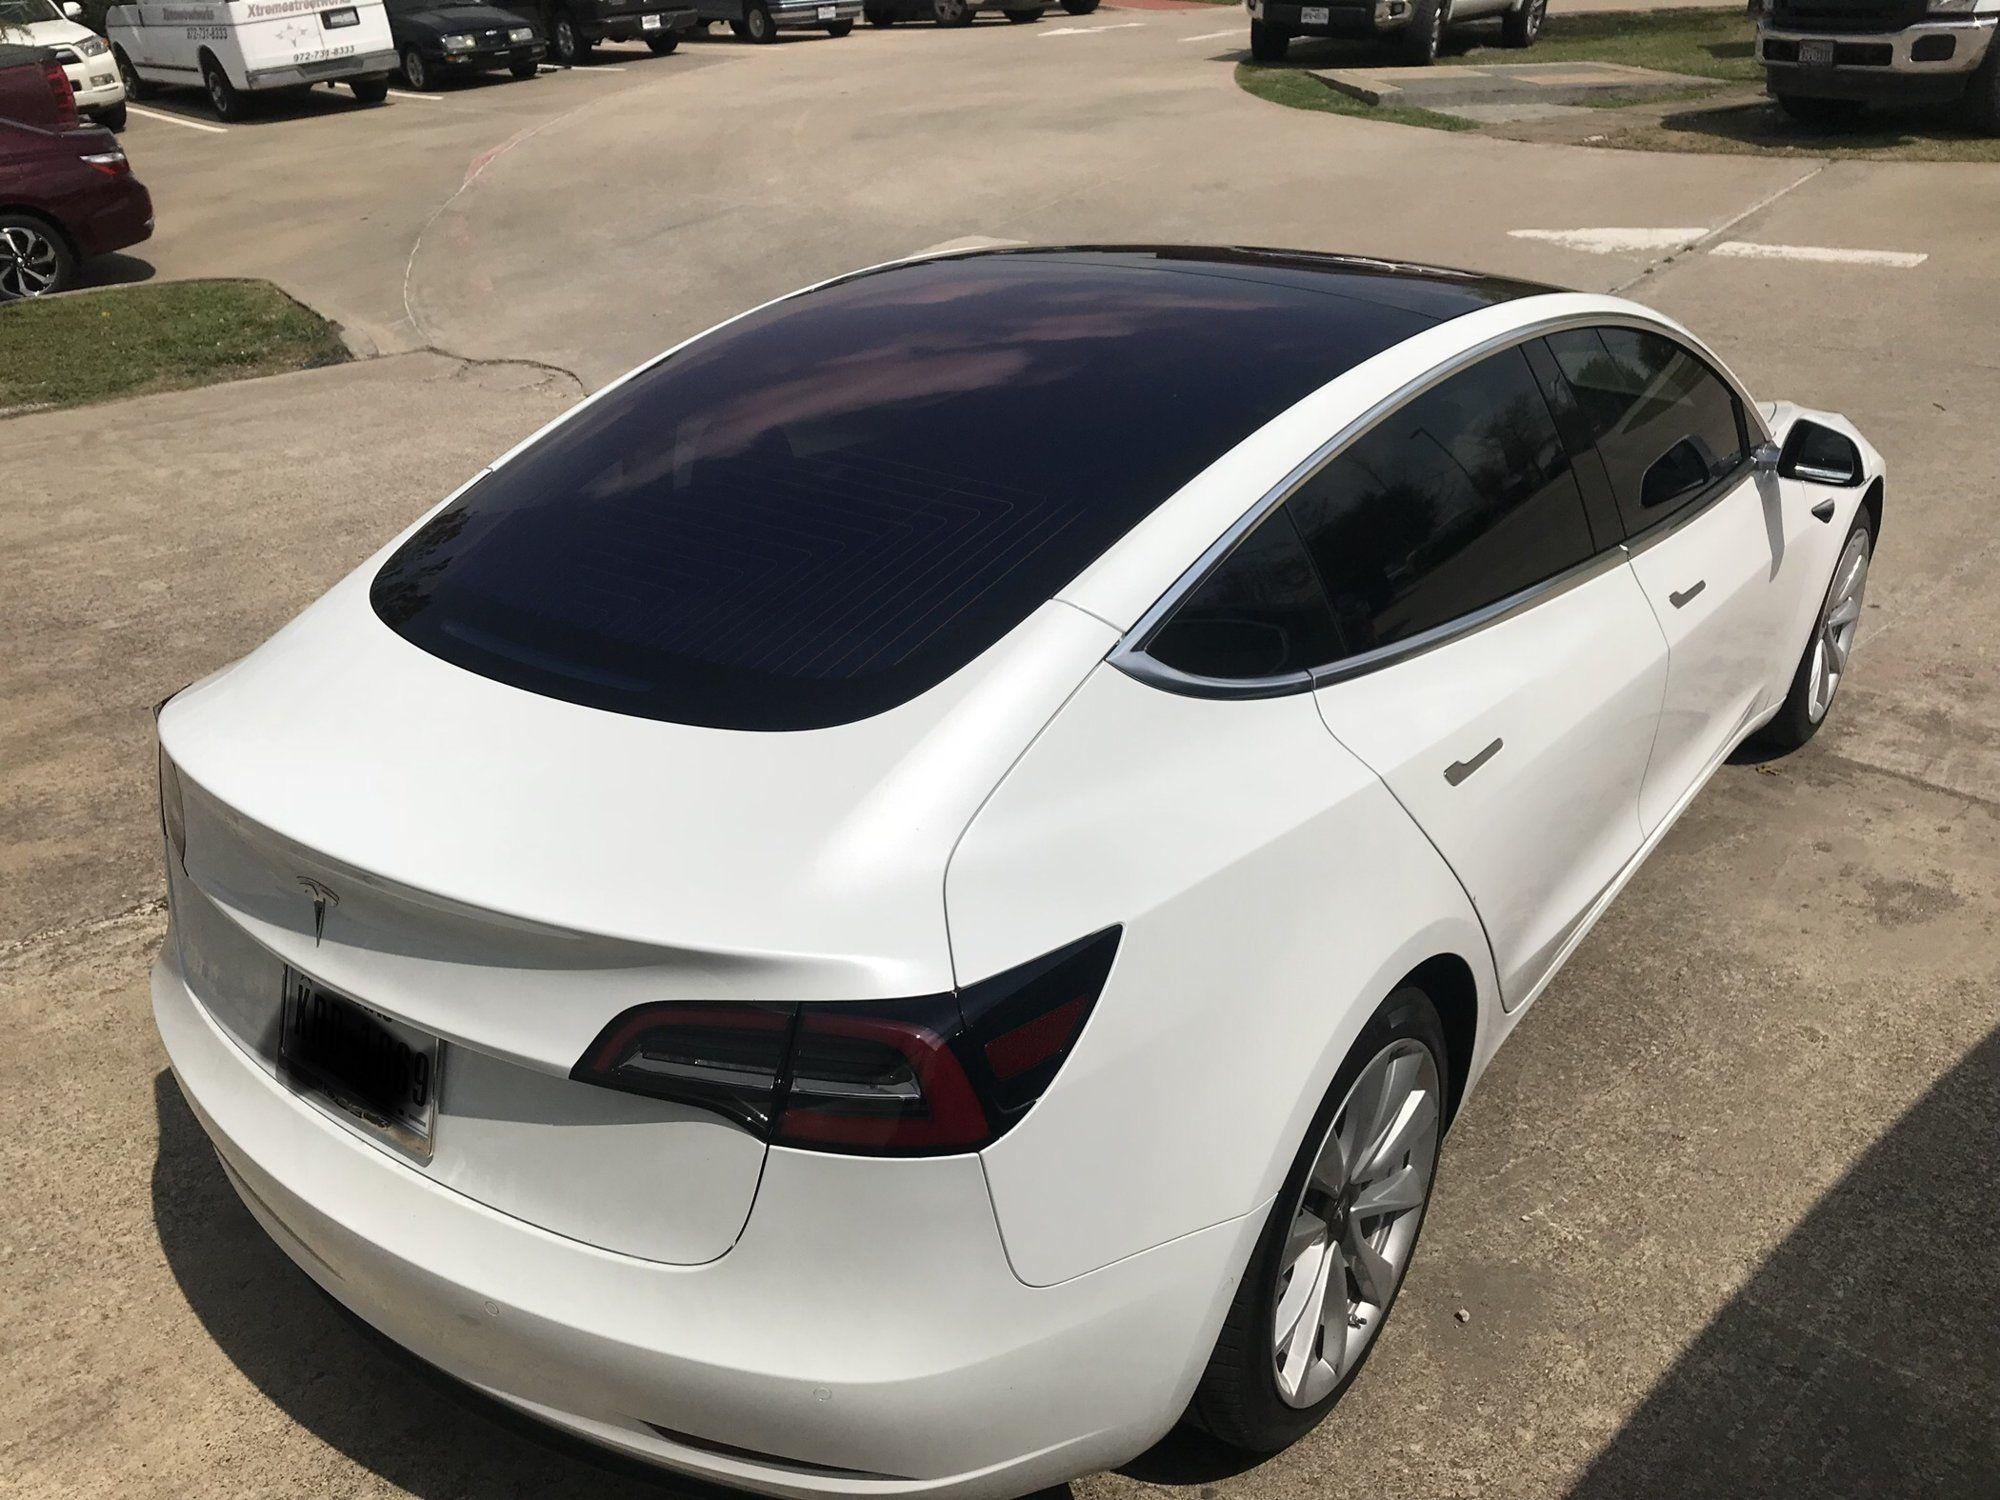 Who S Tinted Their Windows Tesla Tesla Car Tesla Motors